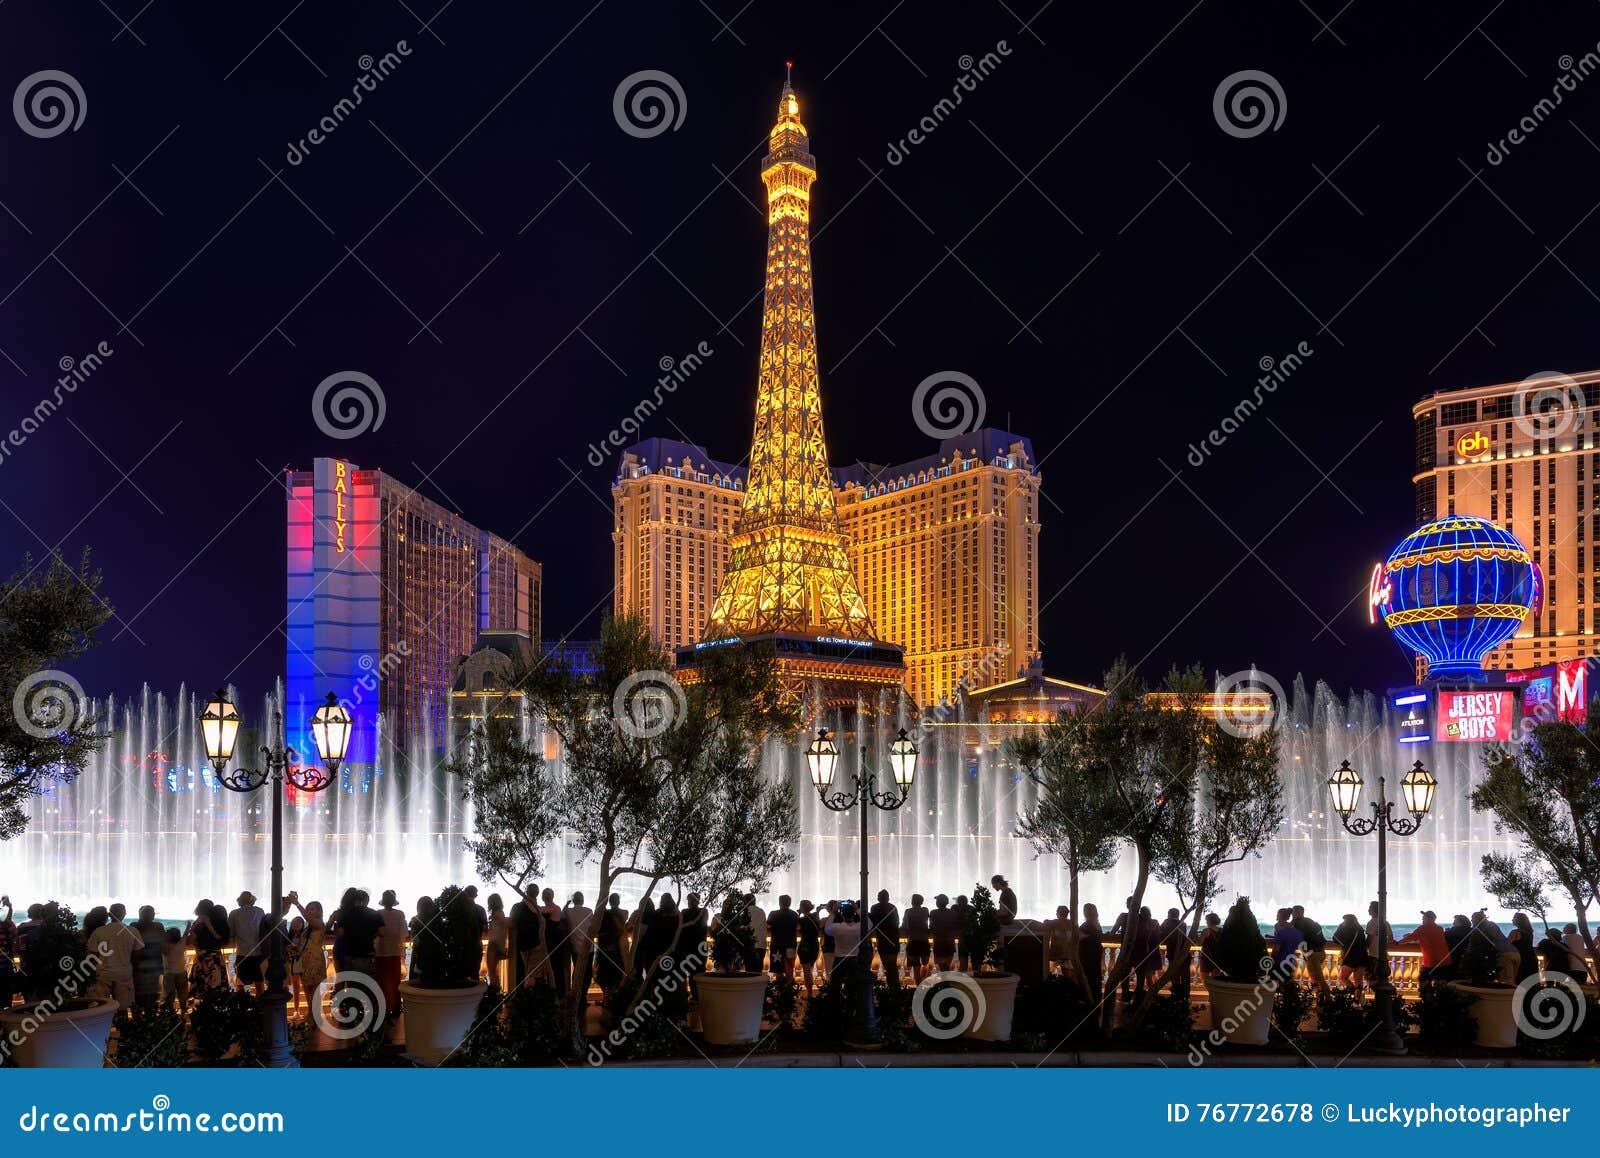 People enjoy Bellagio fountain show at Paris hotel